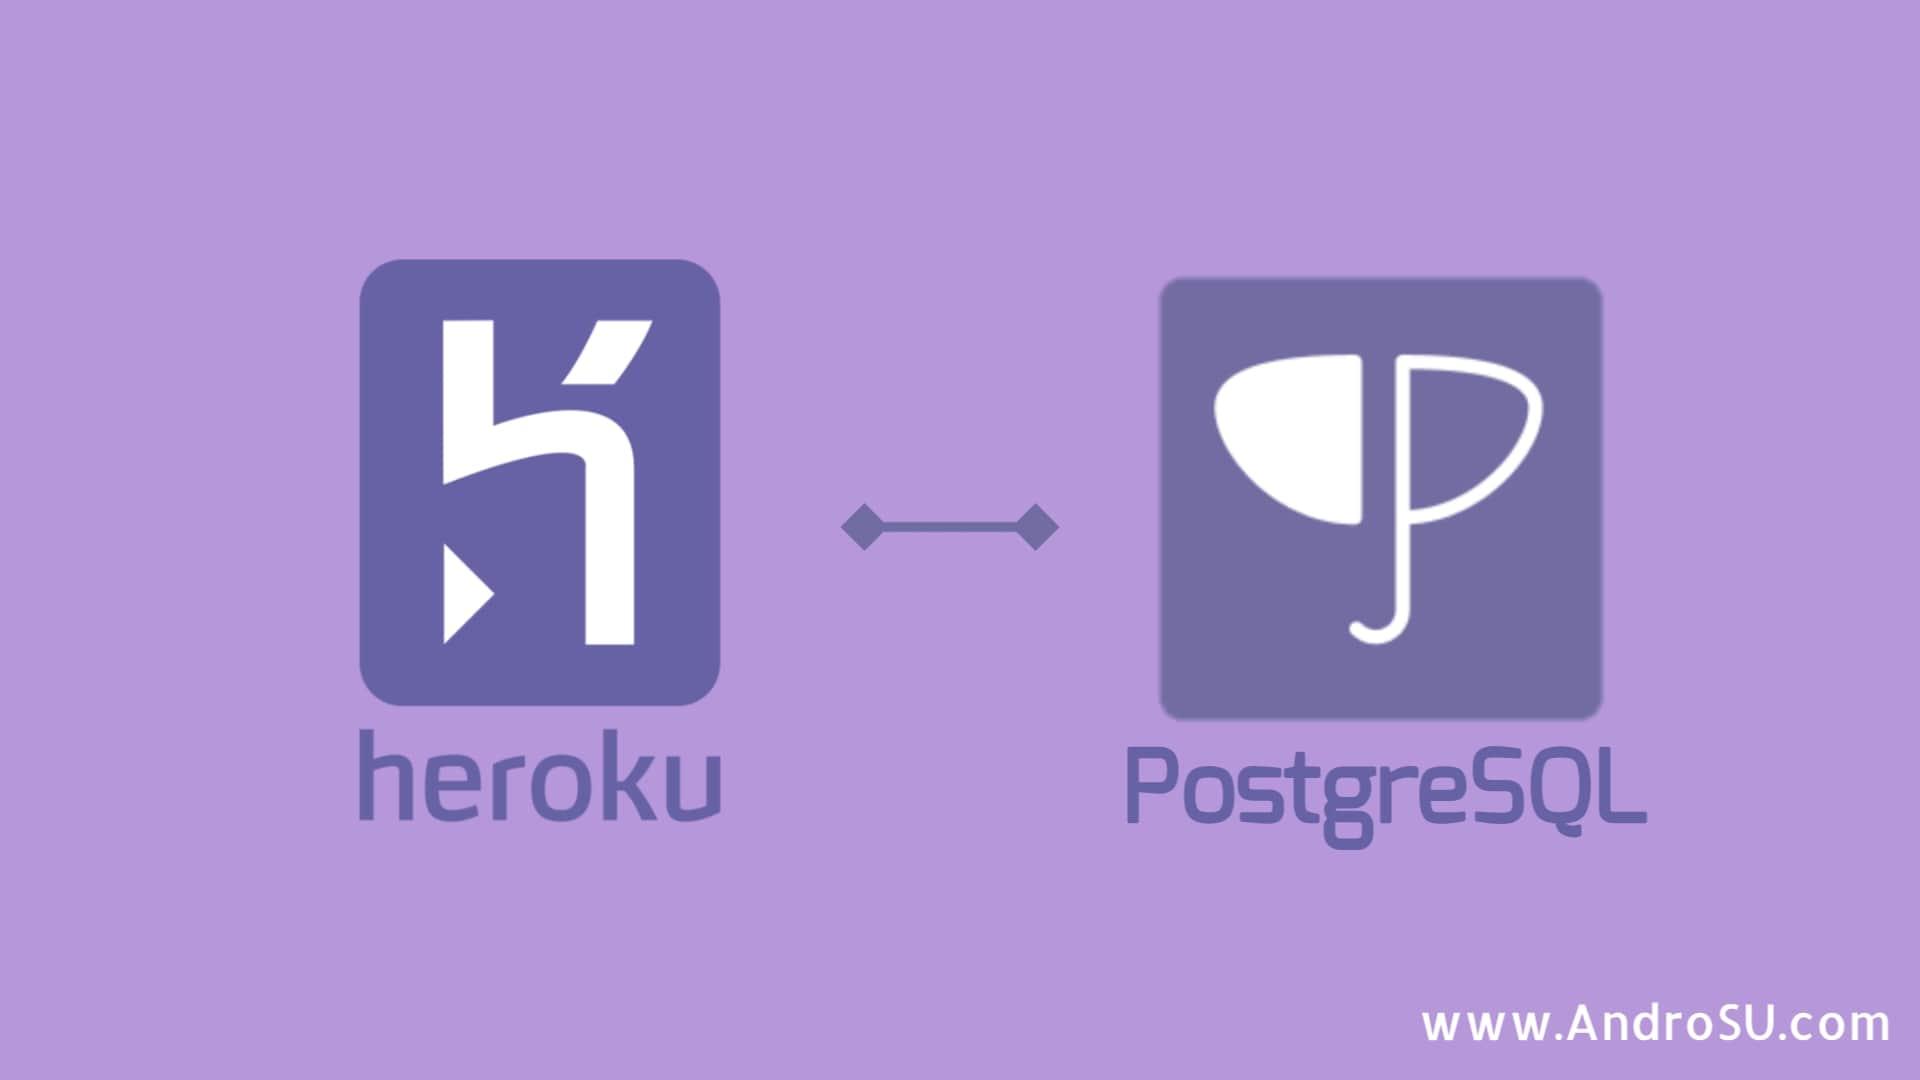 Install PostgreSQL in Termux, Install Heroku PostgreSQL Android